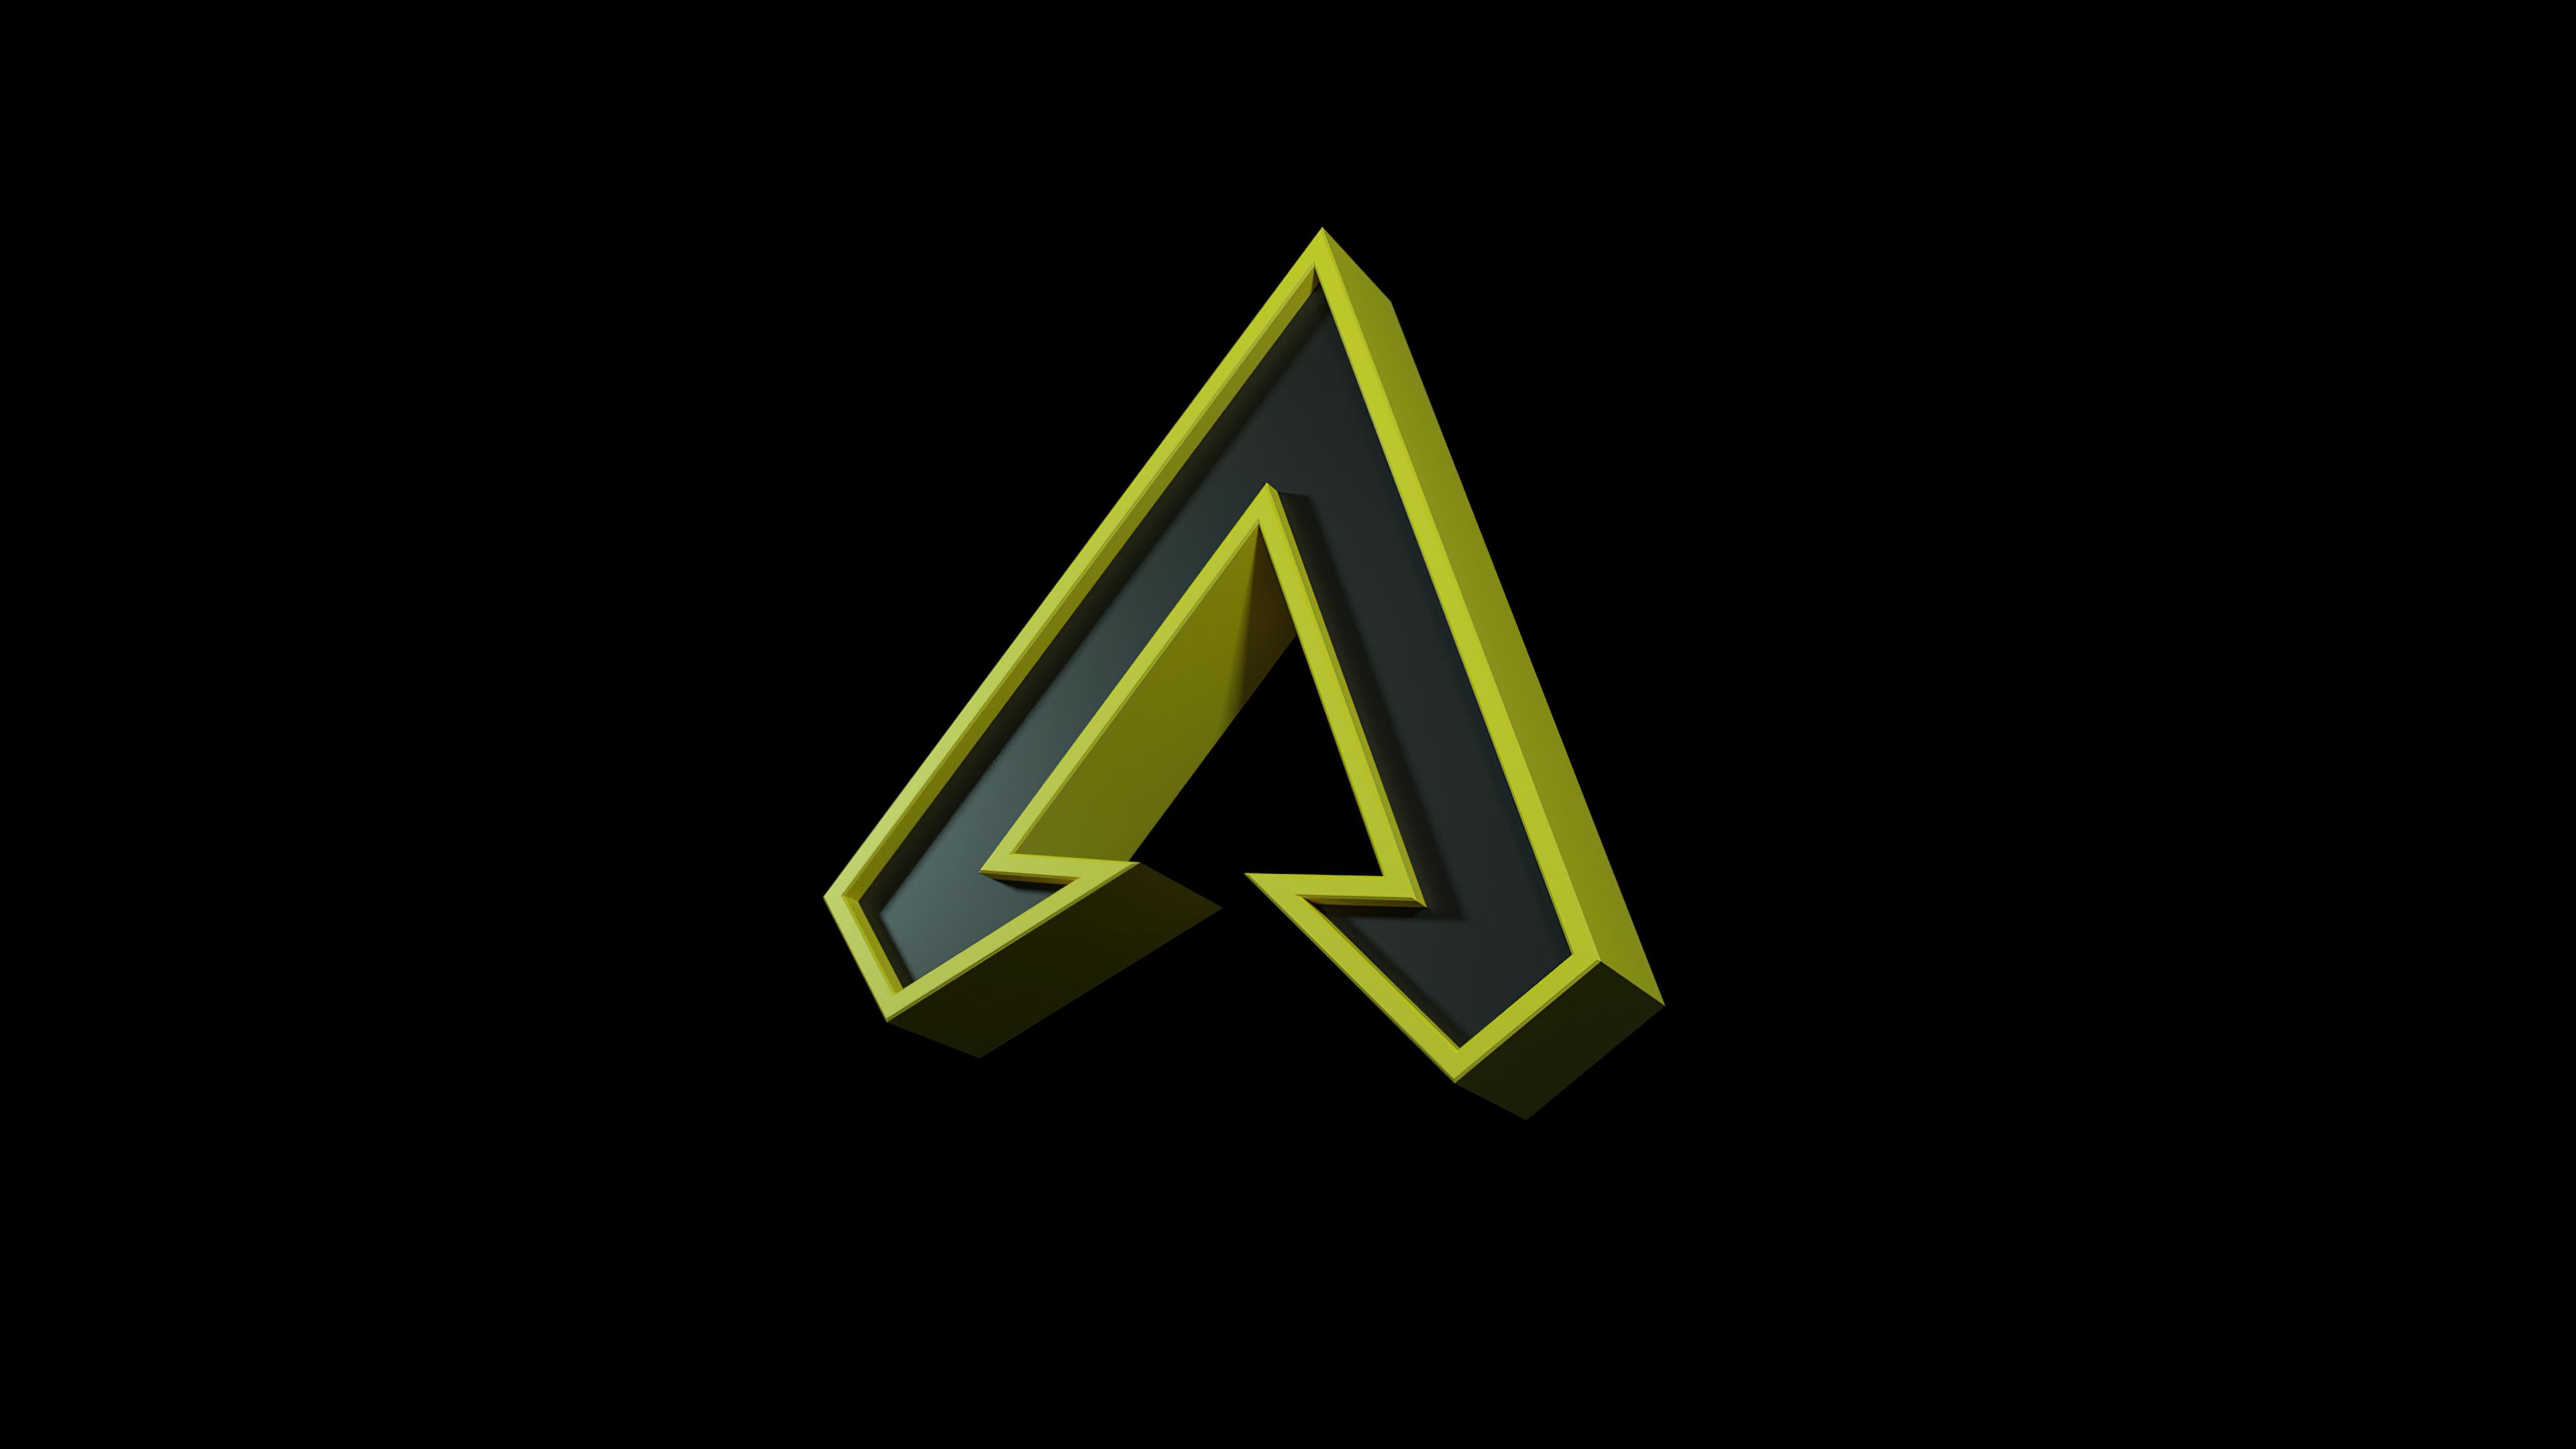 apex legends 3d logo 4k 1615136425 - Apex Legends 3d Logo 4k - Apex Legends 3d Logo 4k wallpapers